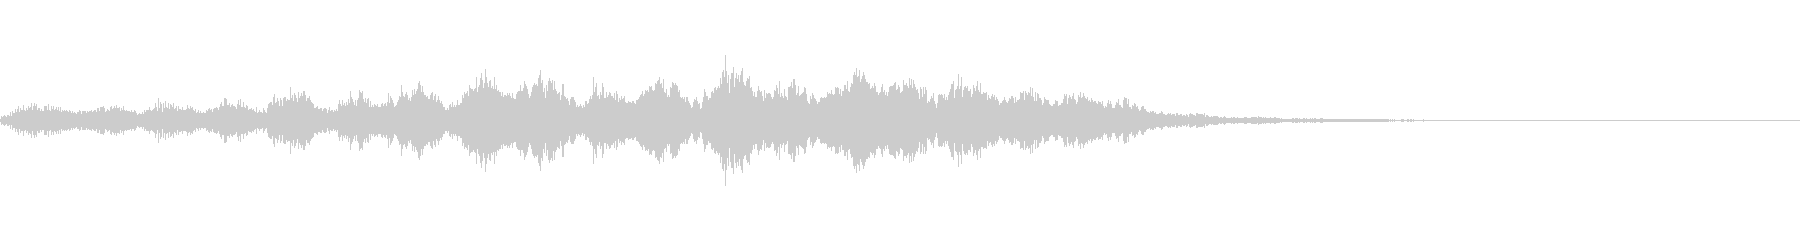 【SE 効果音】奇妙な音4の未再生の波形